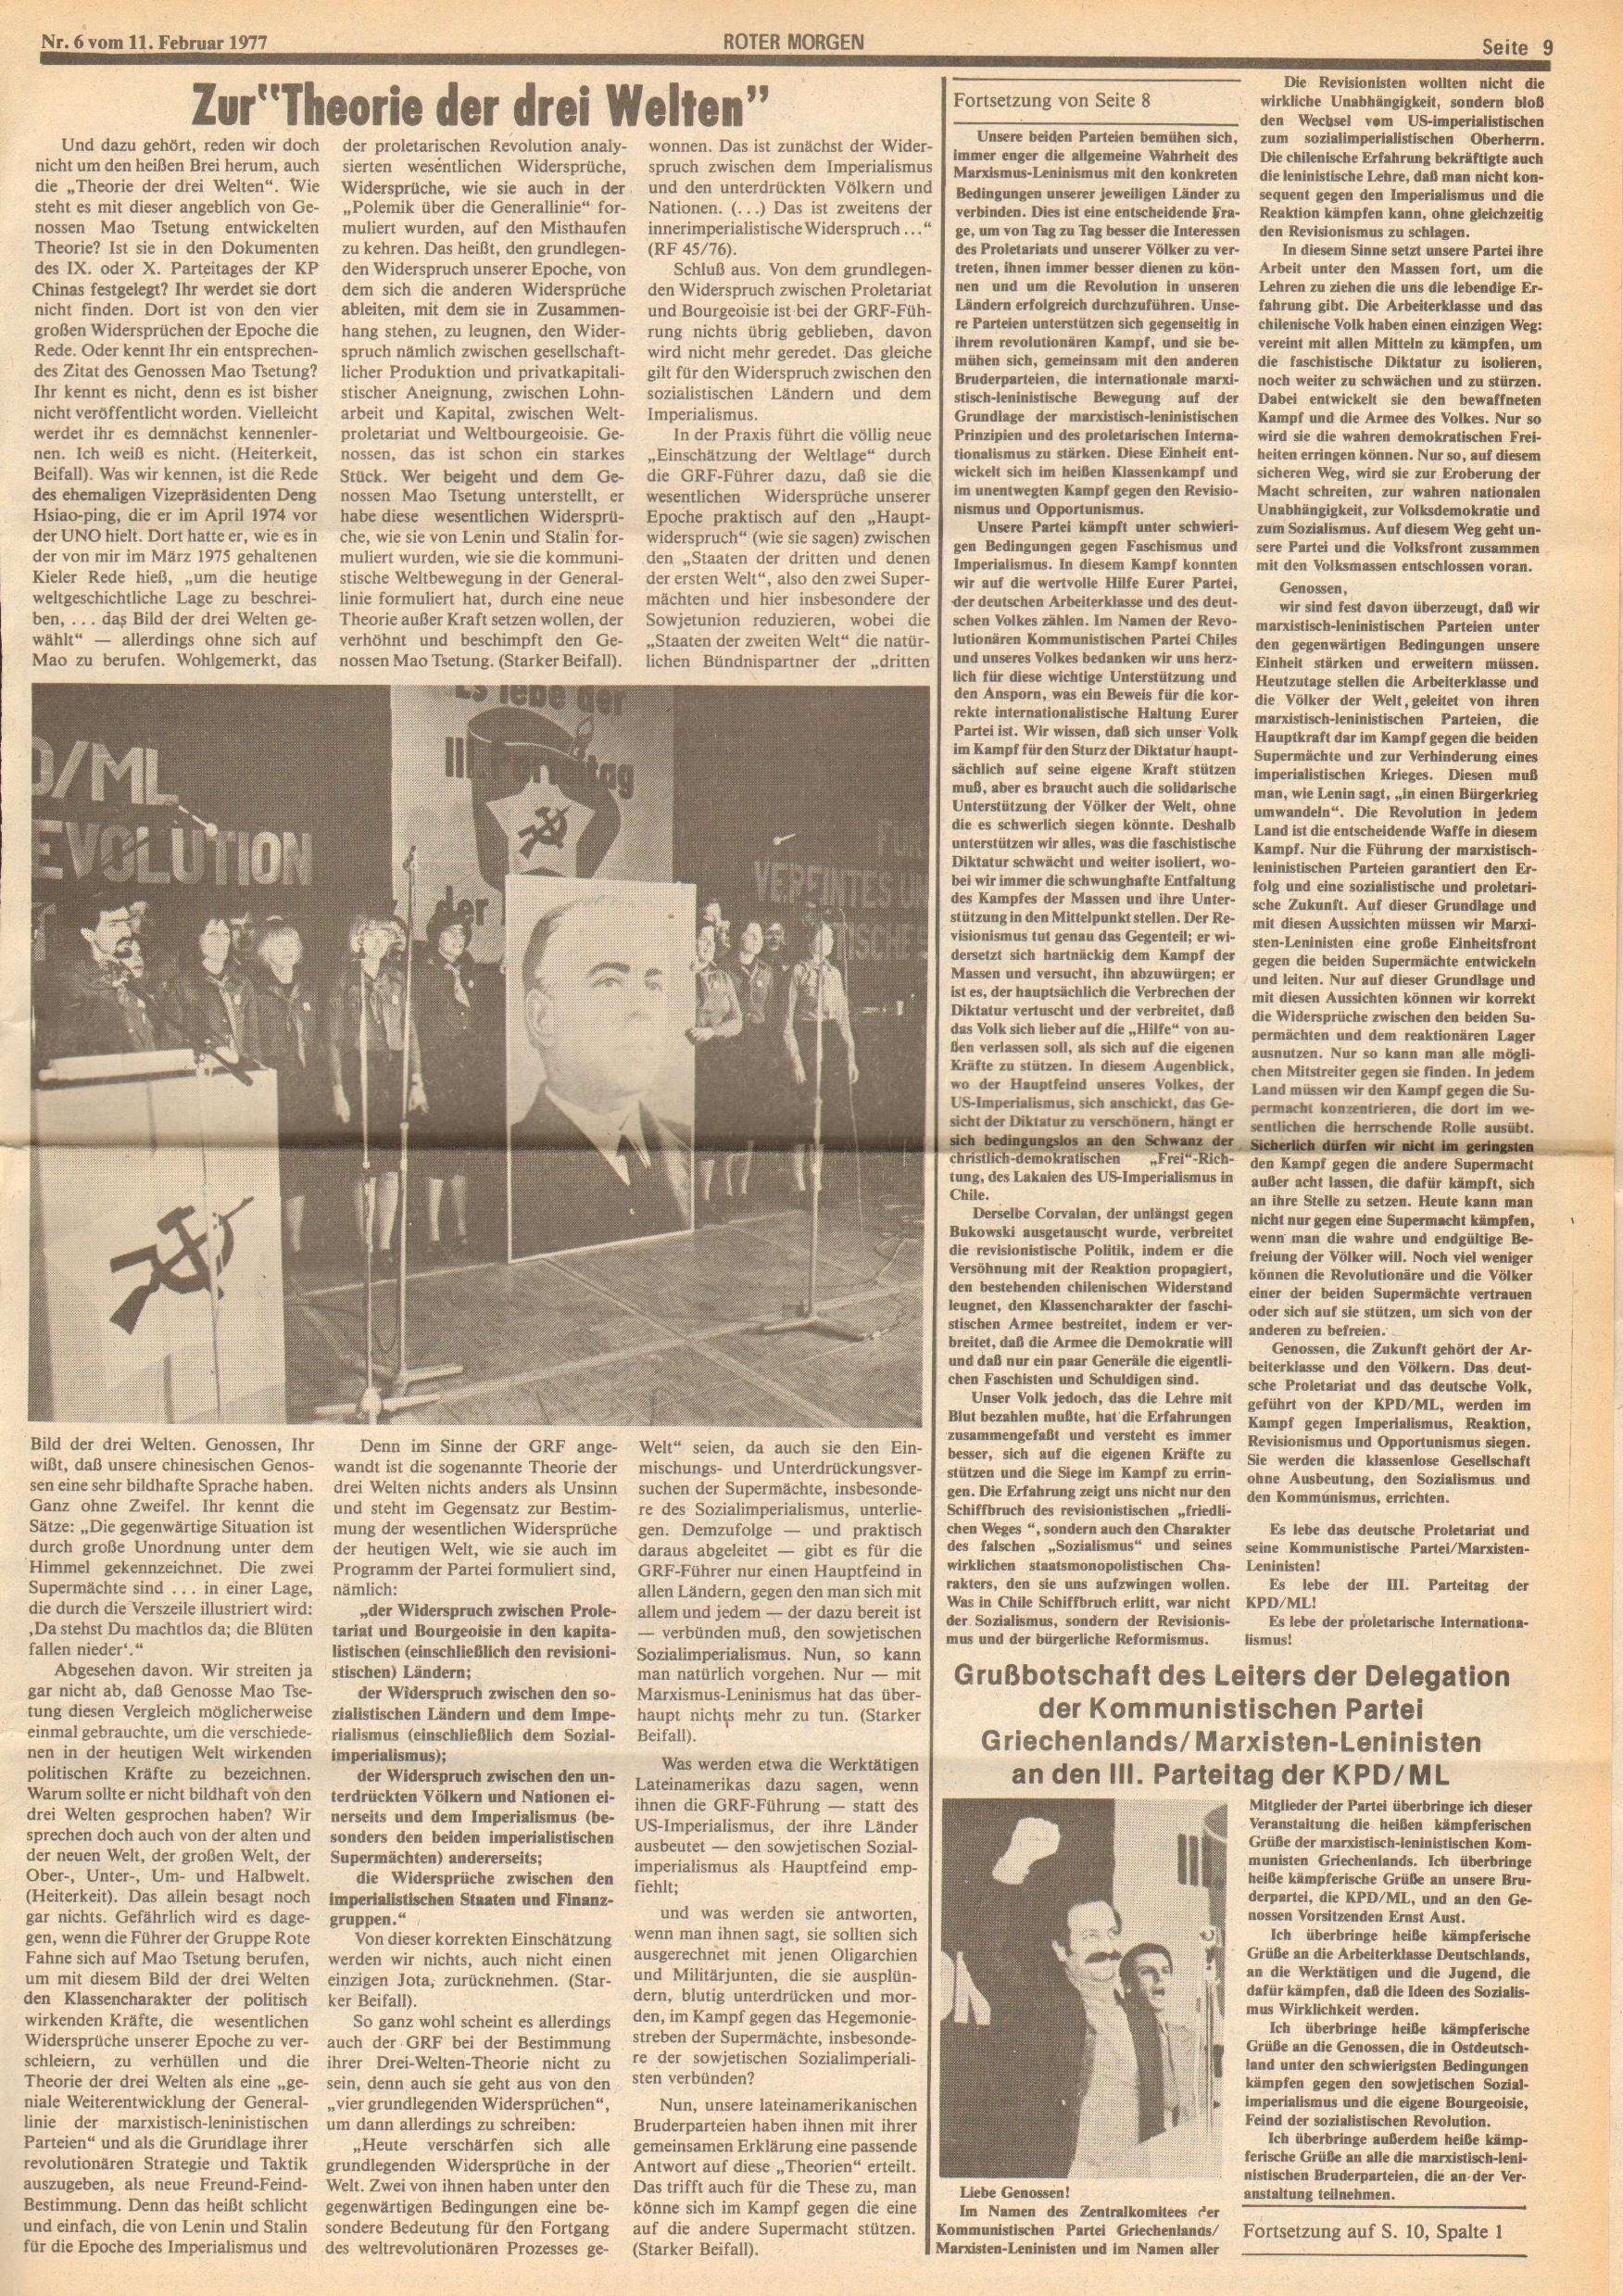 Roter Morgen, 11. Jg., 11. Februar 1977, Nr. 6, Seite 9